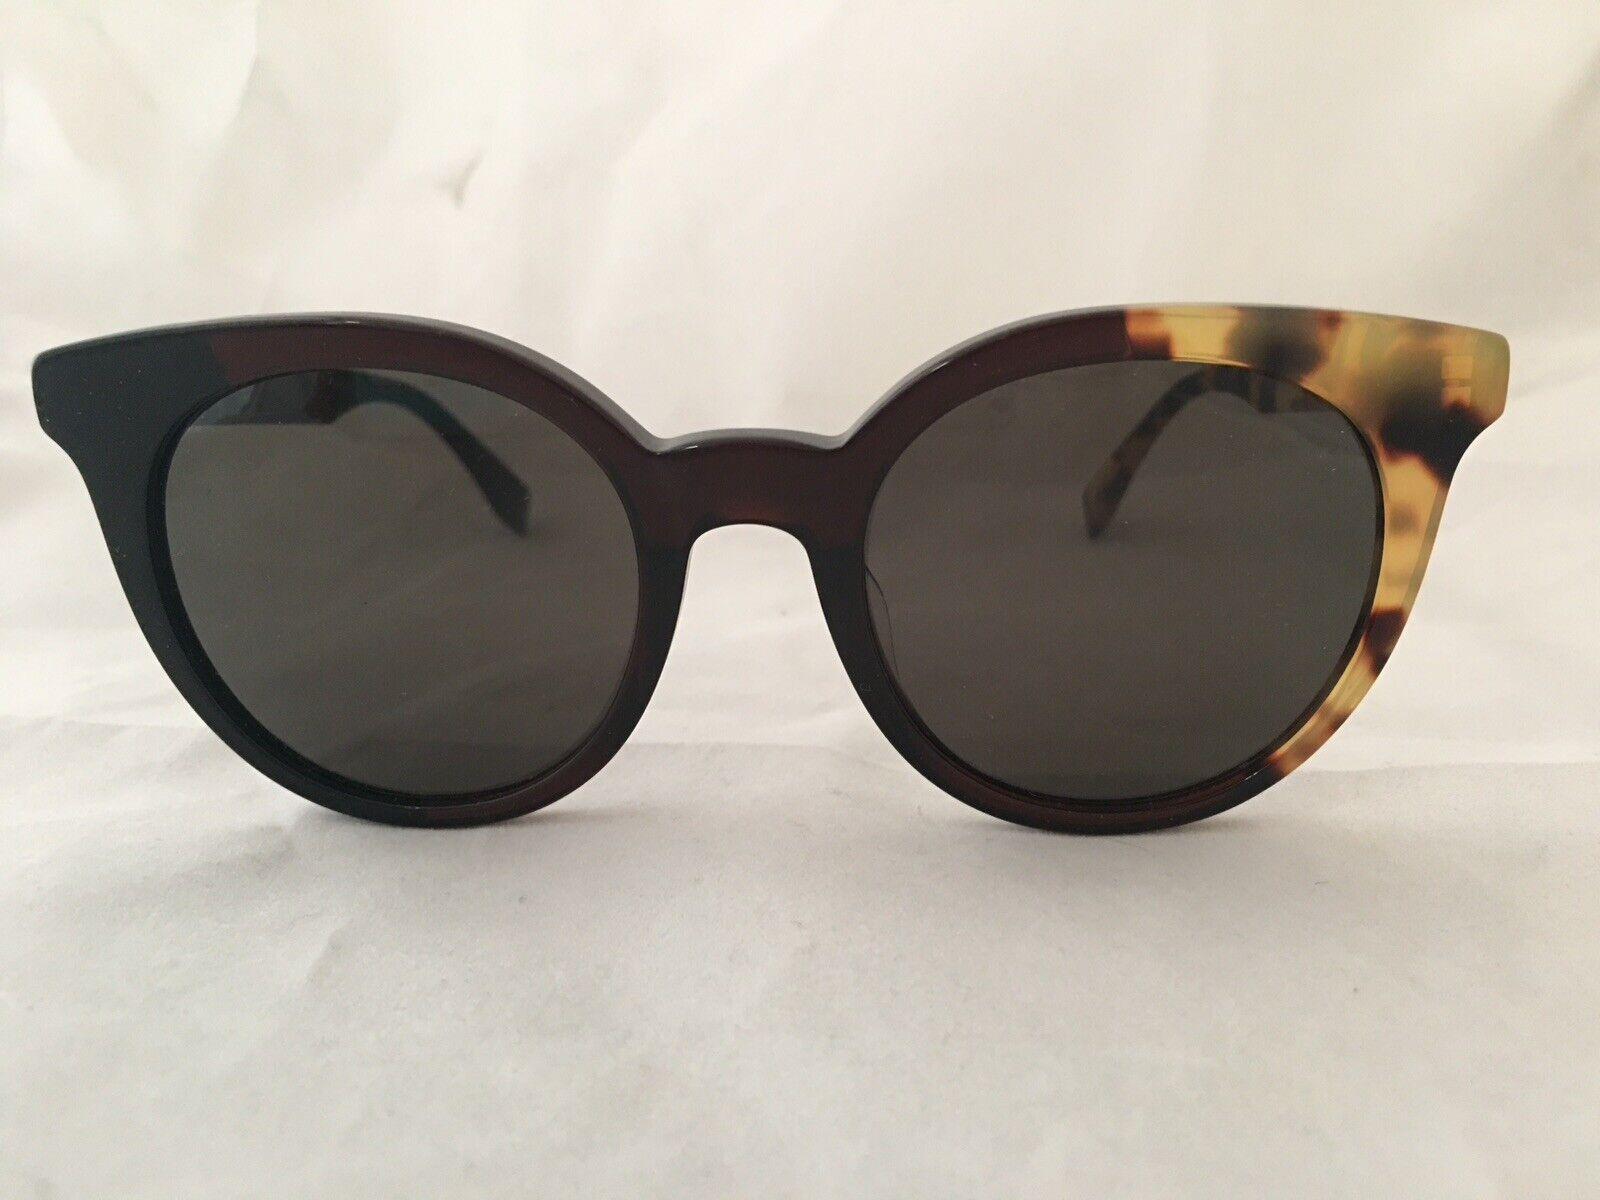 FENDI Sunglasses FF 0064/S Black/Brown/Havana Gray Lens 51/21/140mm